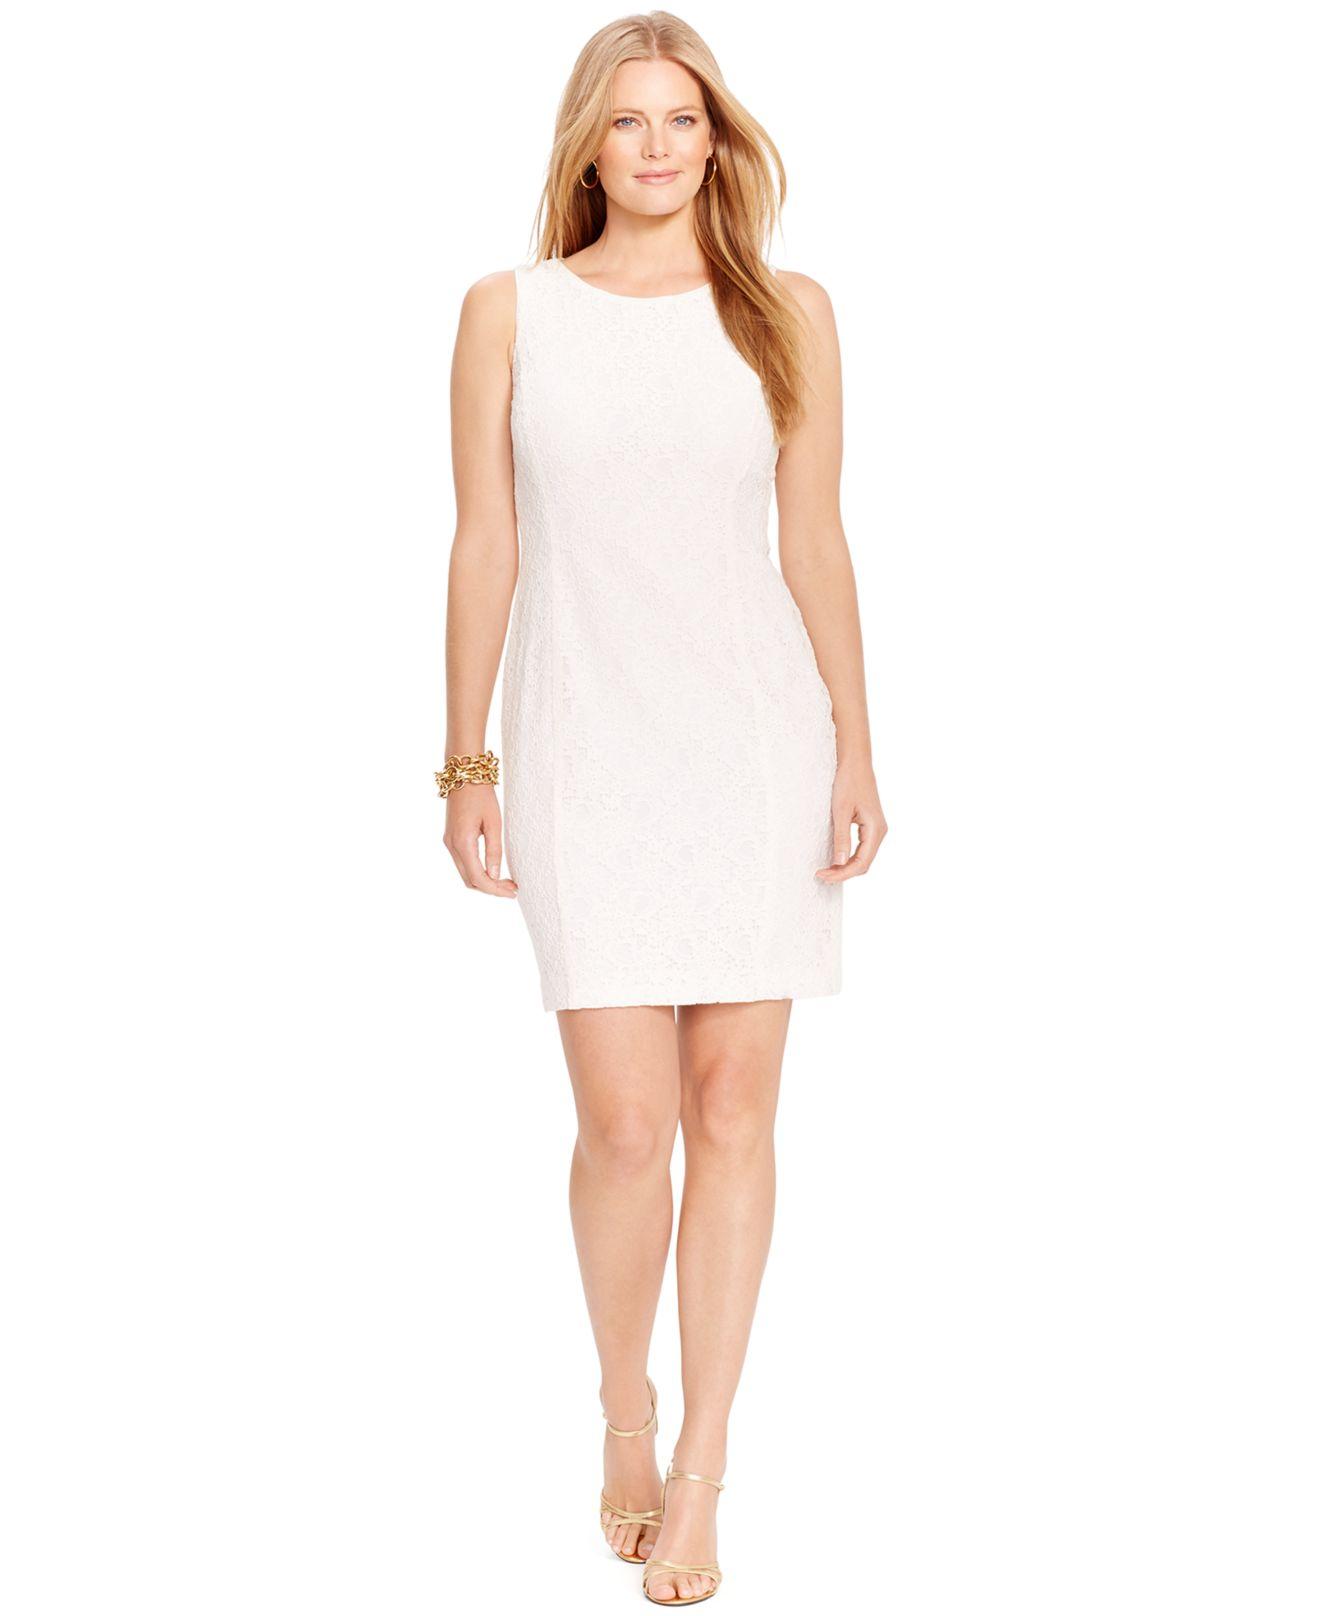 Lyst Lauren By Ralph Lauren Plus Size Sleeveless Lace Dress In White